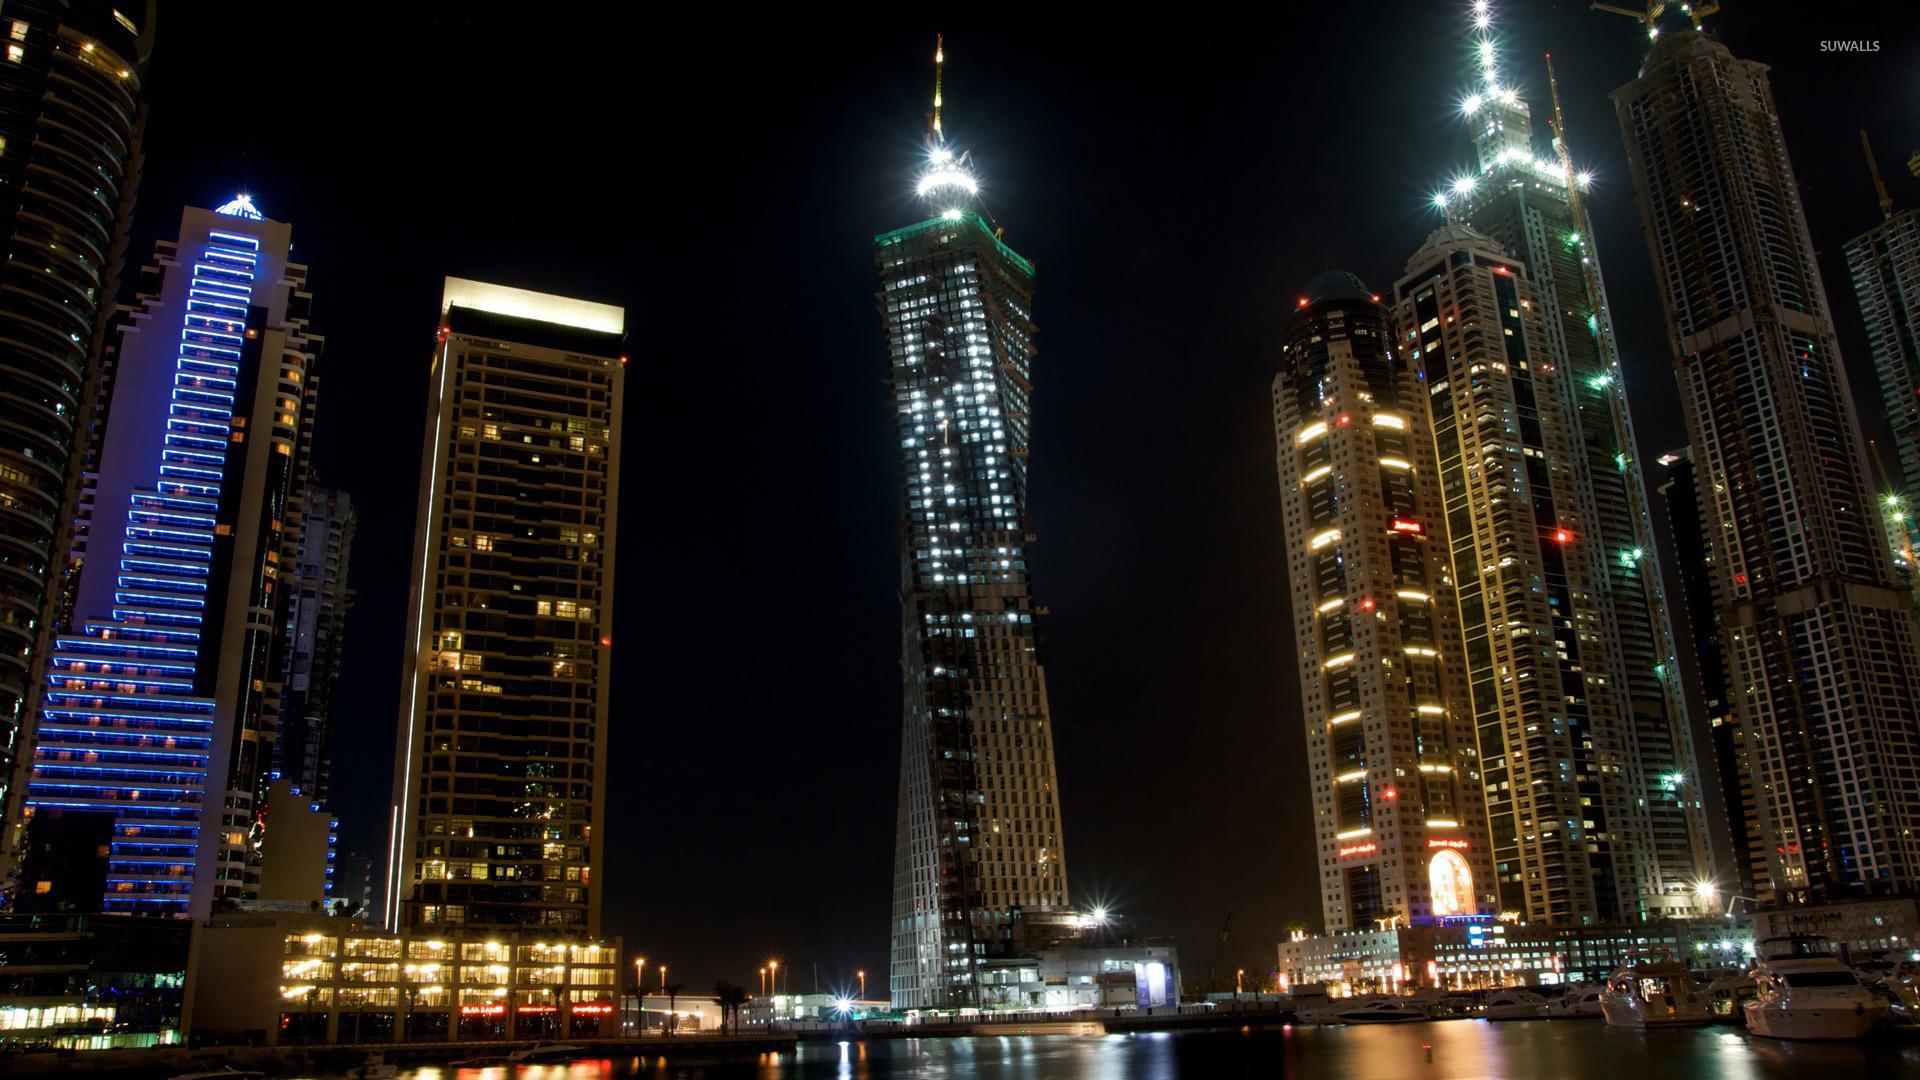 Popular Wallpaper Night Dubai - dubai-at-night-22607-1920x1080  Best Photo Reference-649033.jpg